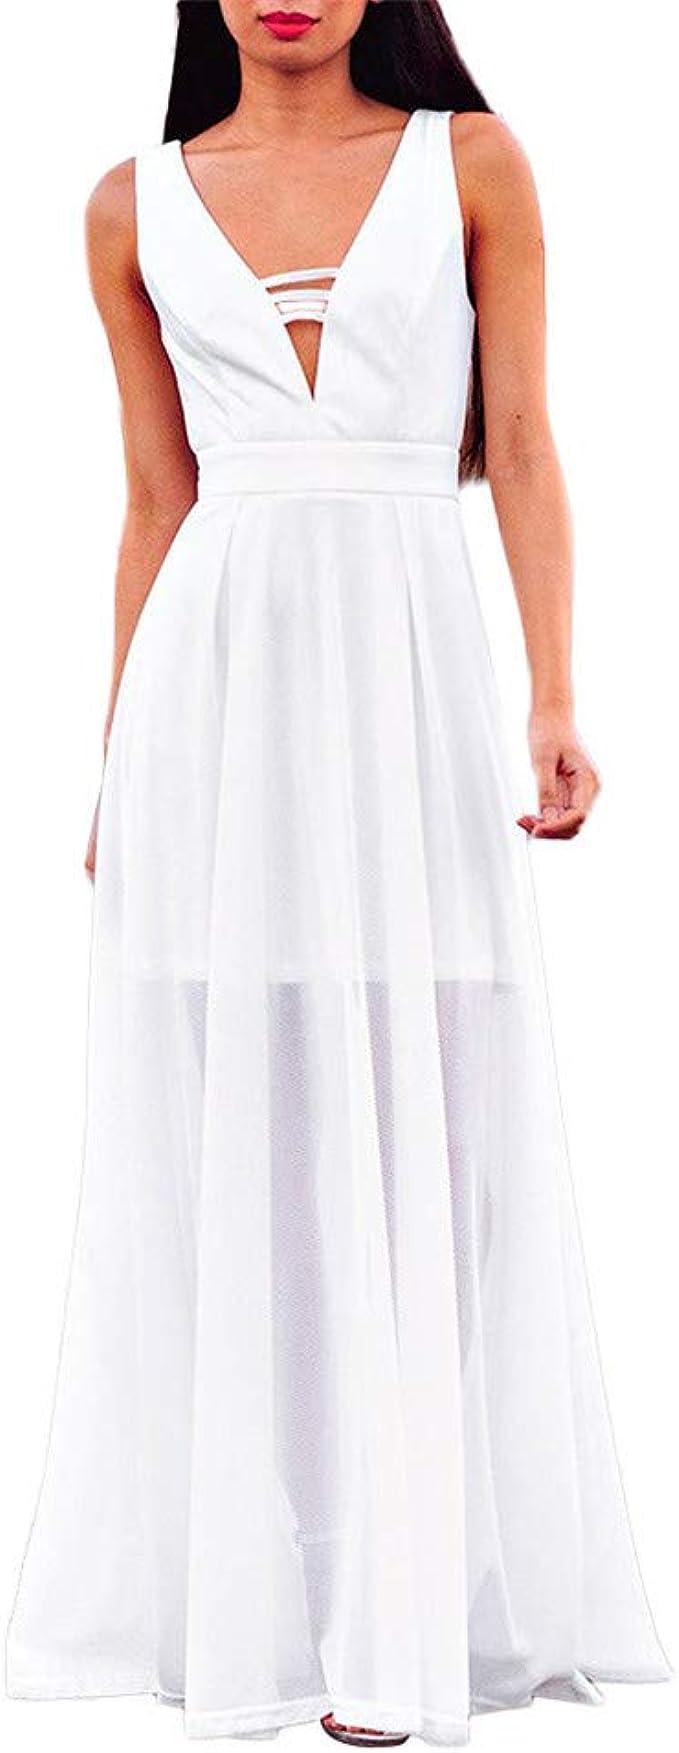 Aiserkly Chiffon Kleid Damen Sommerkleid Stradkleid Sexy V